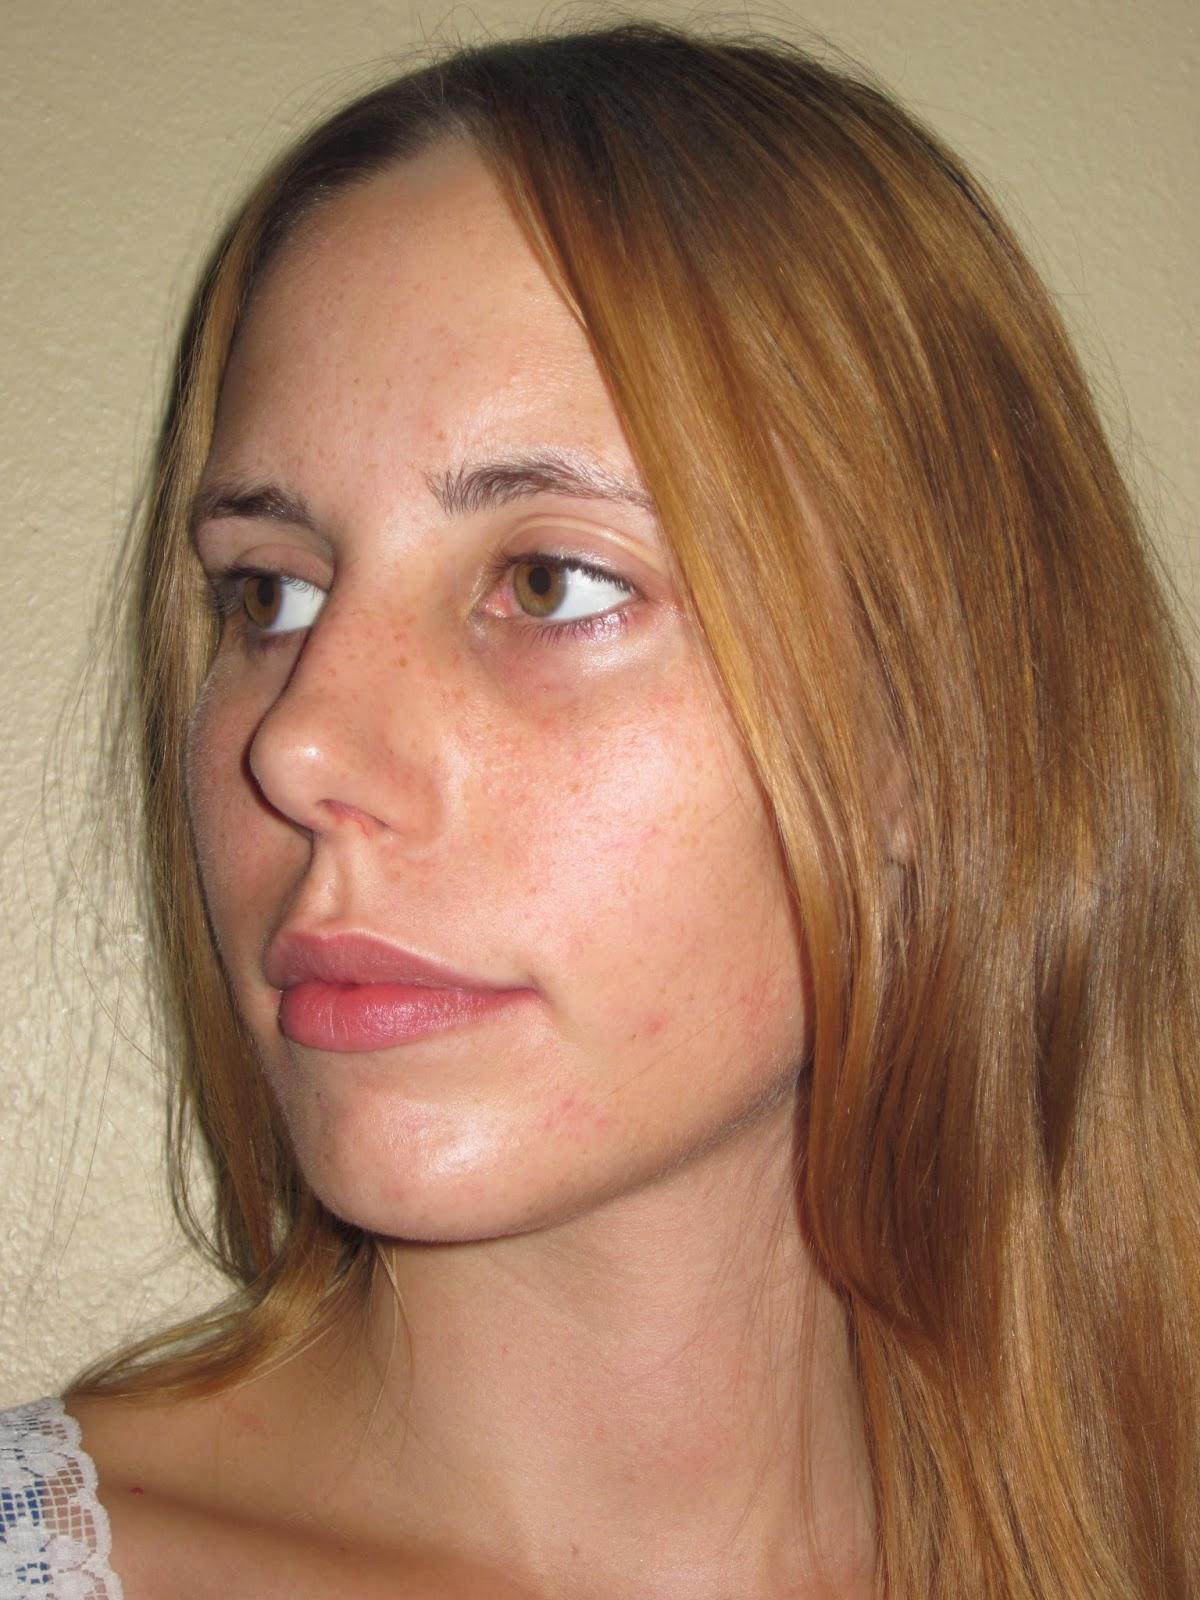 Lauren bacall nude photos — photo 11